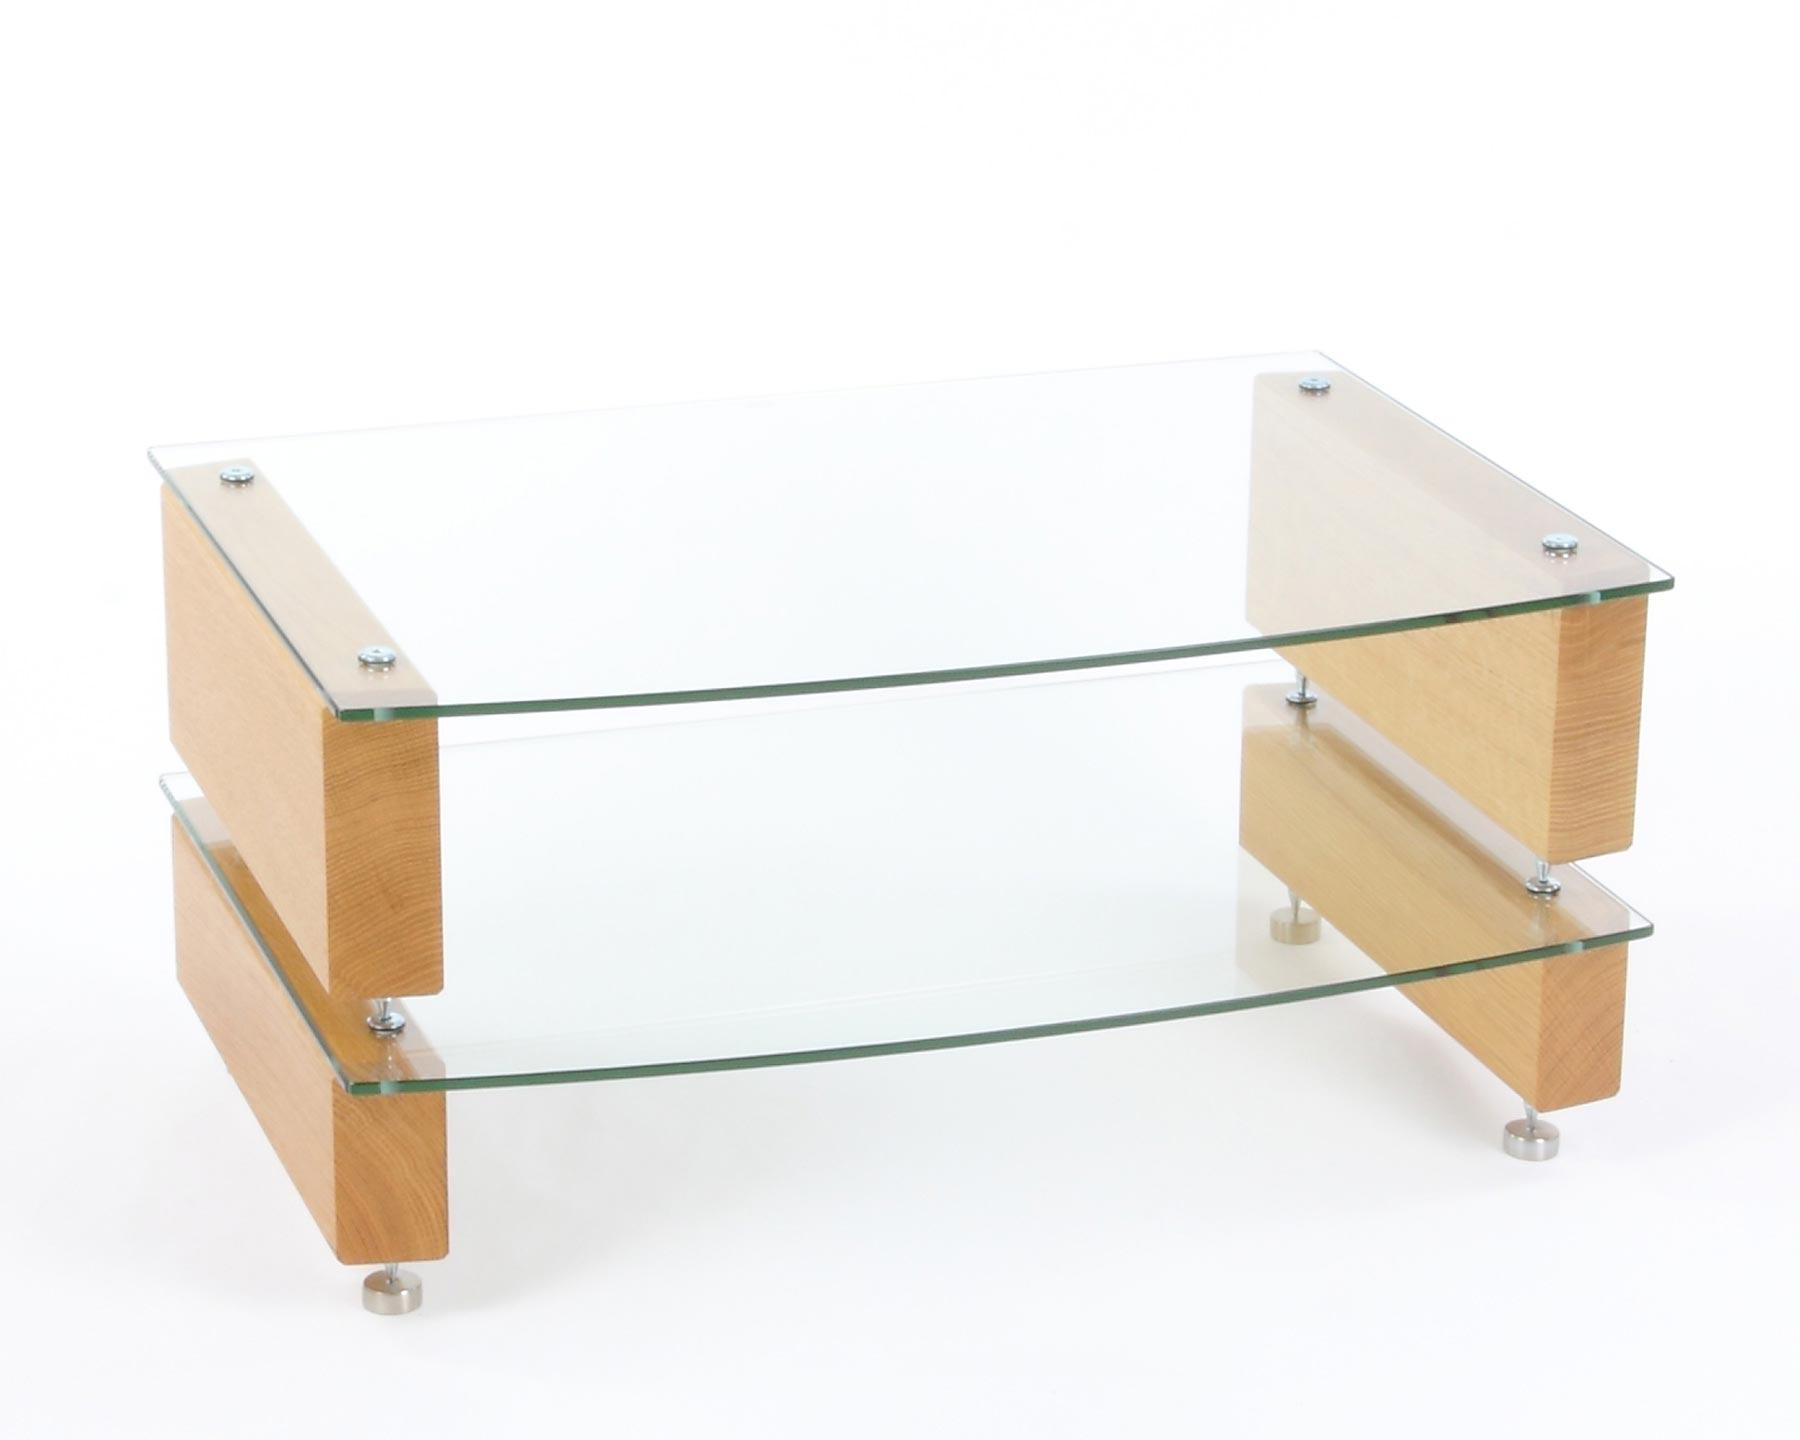 custom design hifi rack milan 6 hifi 2 eiche klarem glas bellevue audio gmbh. Black Bedroom Furniture Sets. Home Design Ideas